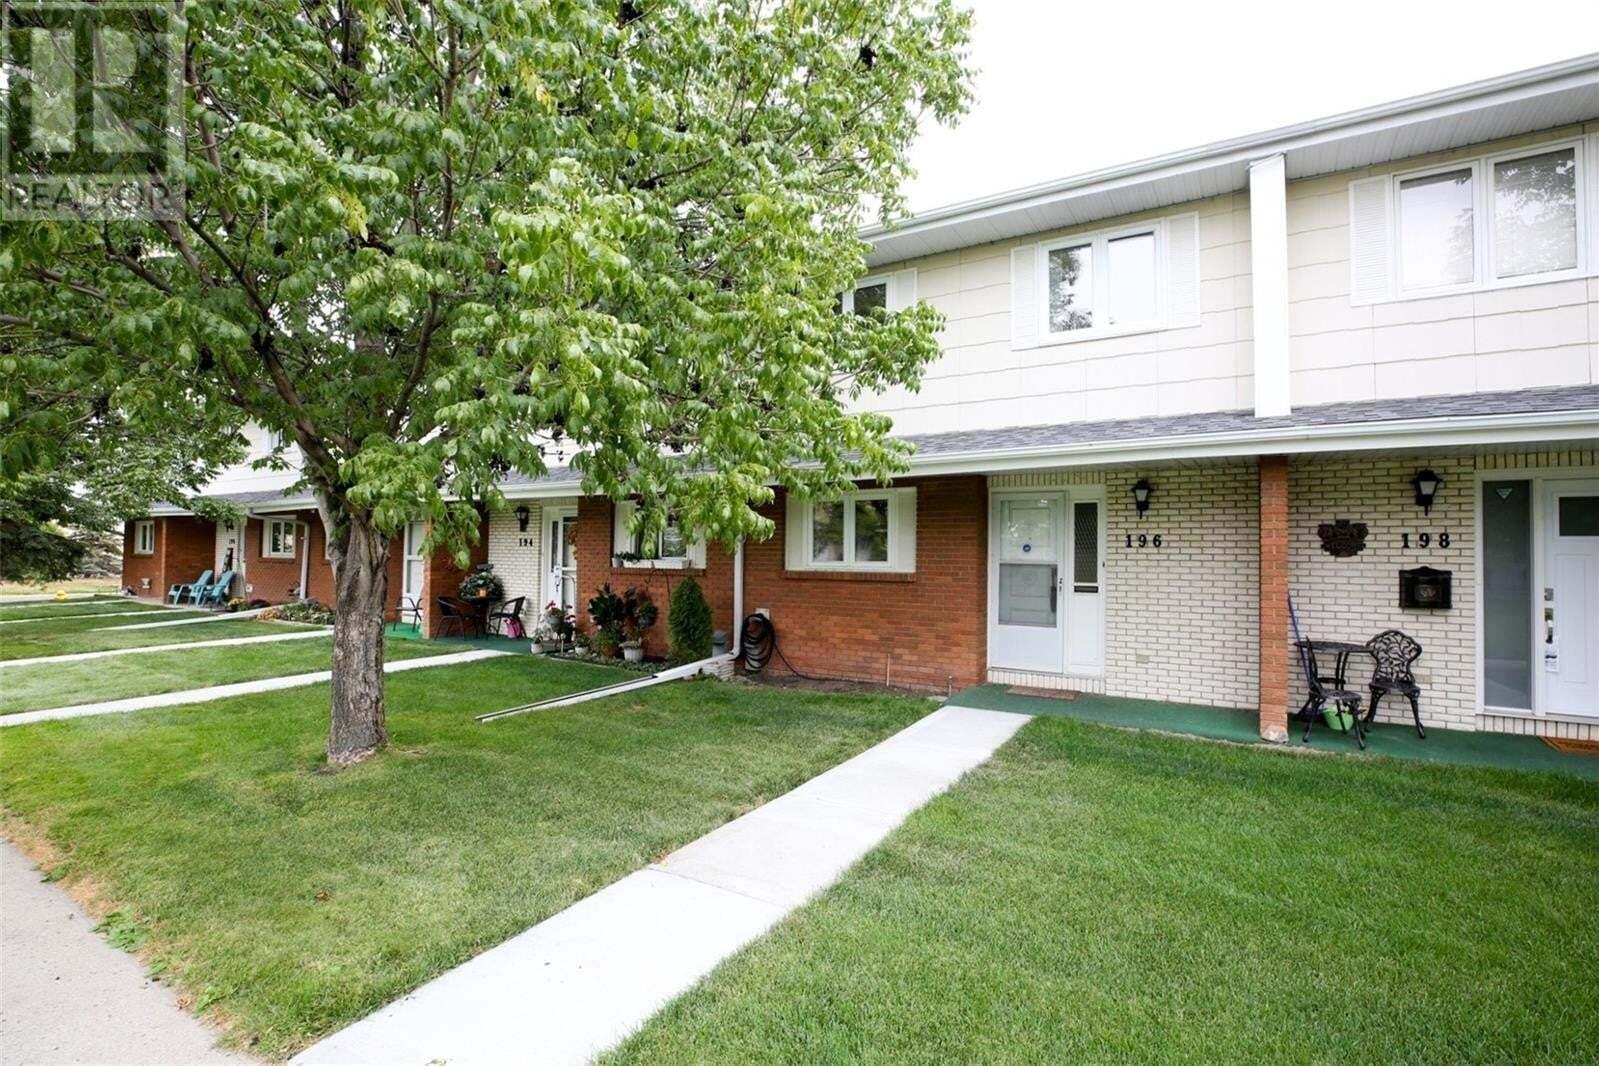 Townhouse for sale at 196 Plainsview Dr Regina Saskatchewan - MLS: SK827157